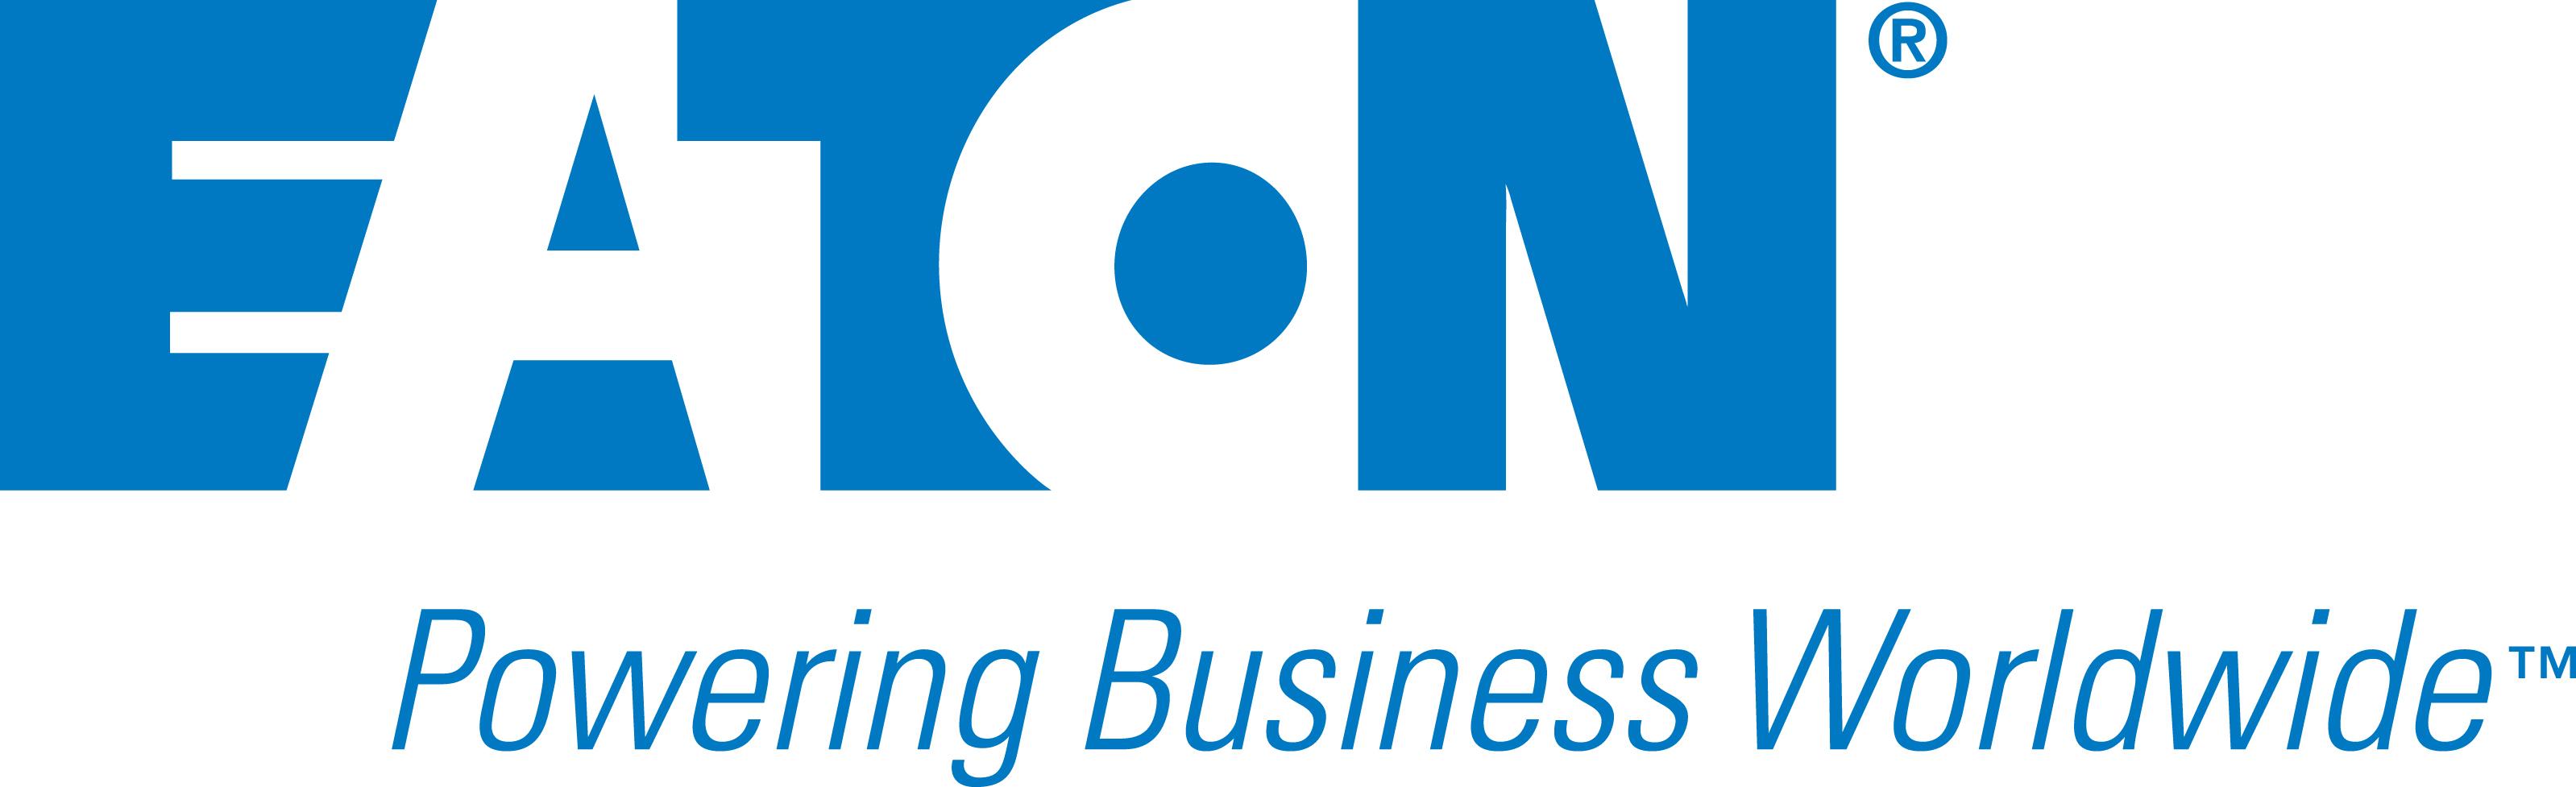 EATON_logo illuminating engineering society recognizes four eaton led  at alyssarenee.co